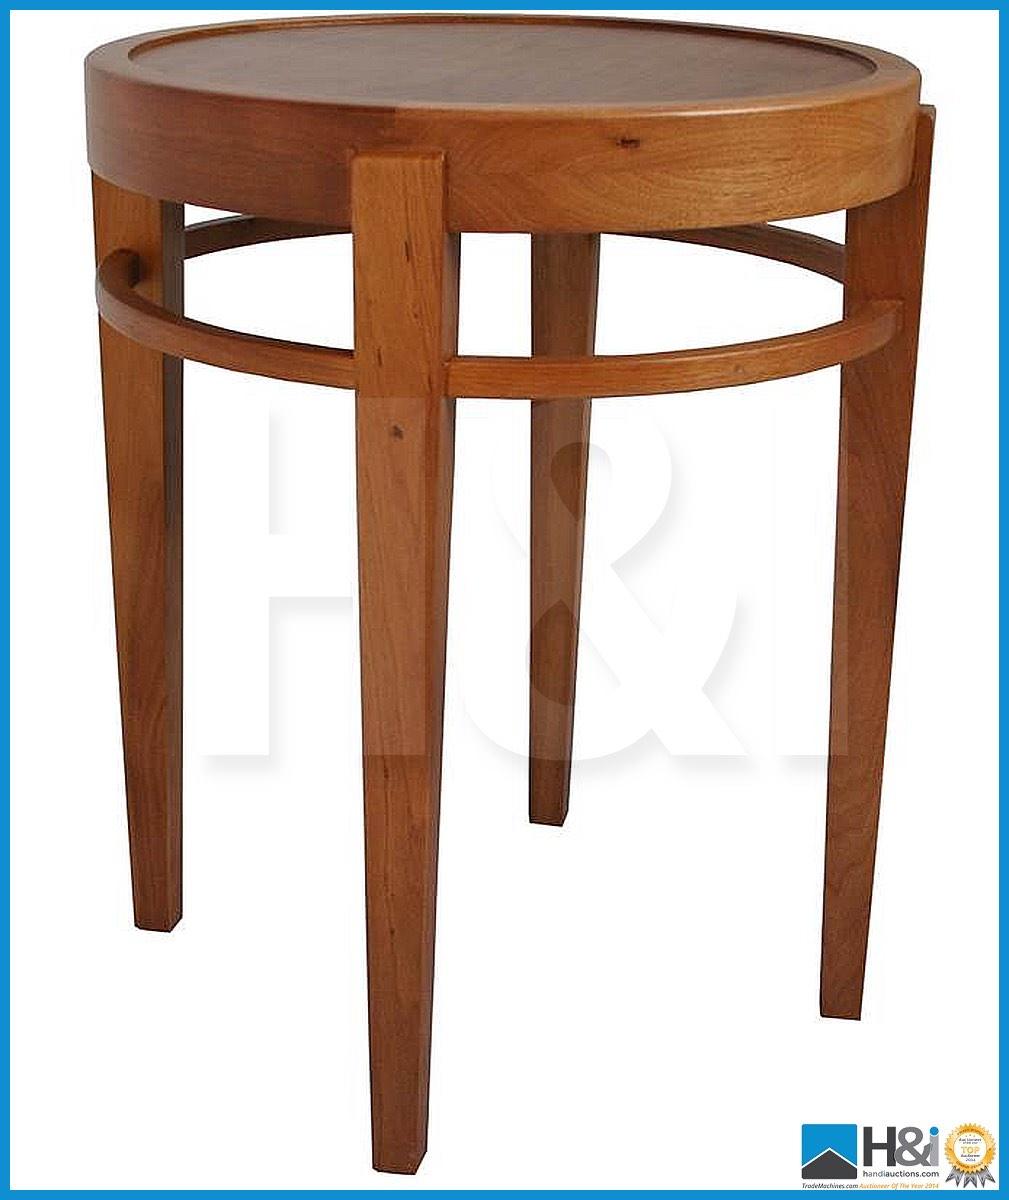 Lot 5 - Stunning black walnut bedroom furniture set comprising: 2-door wardrobe - H 193cm x W 110cm